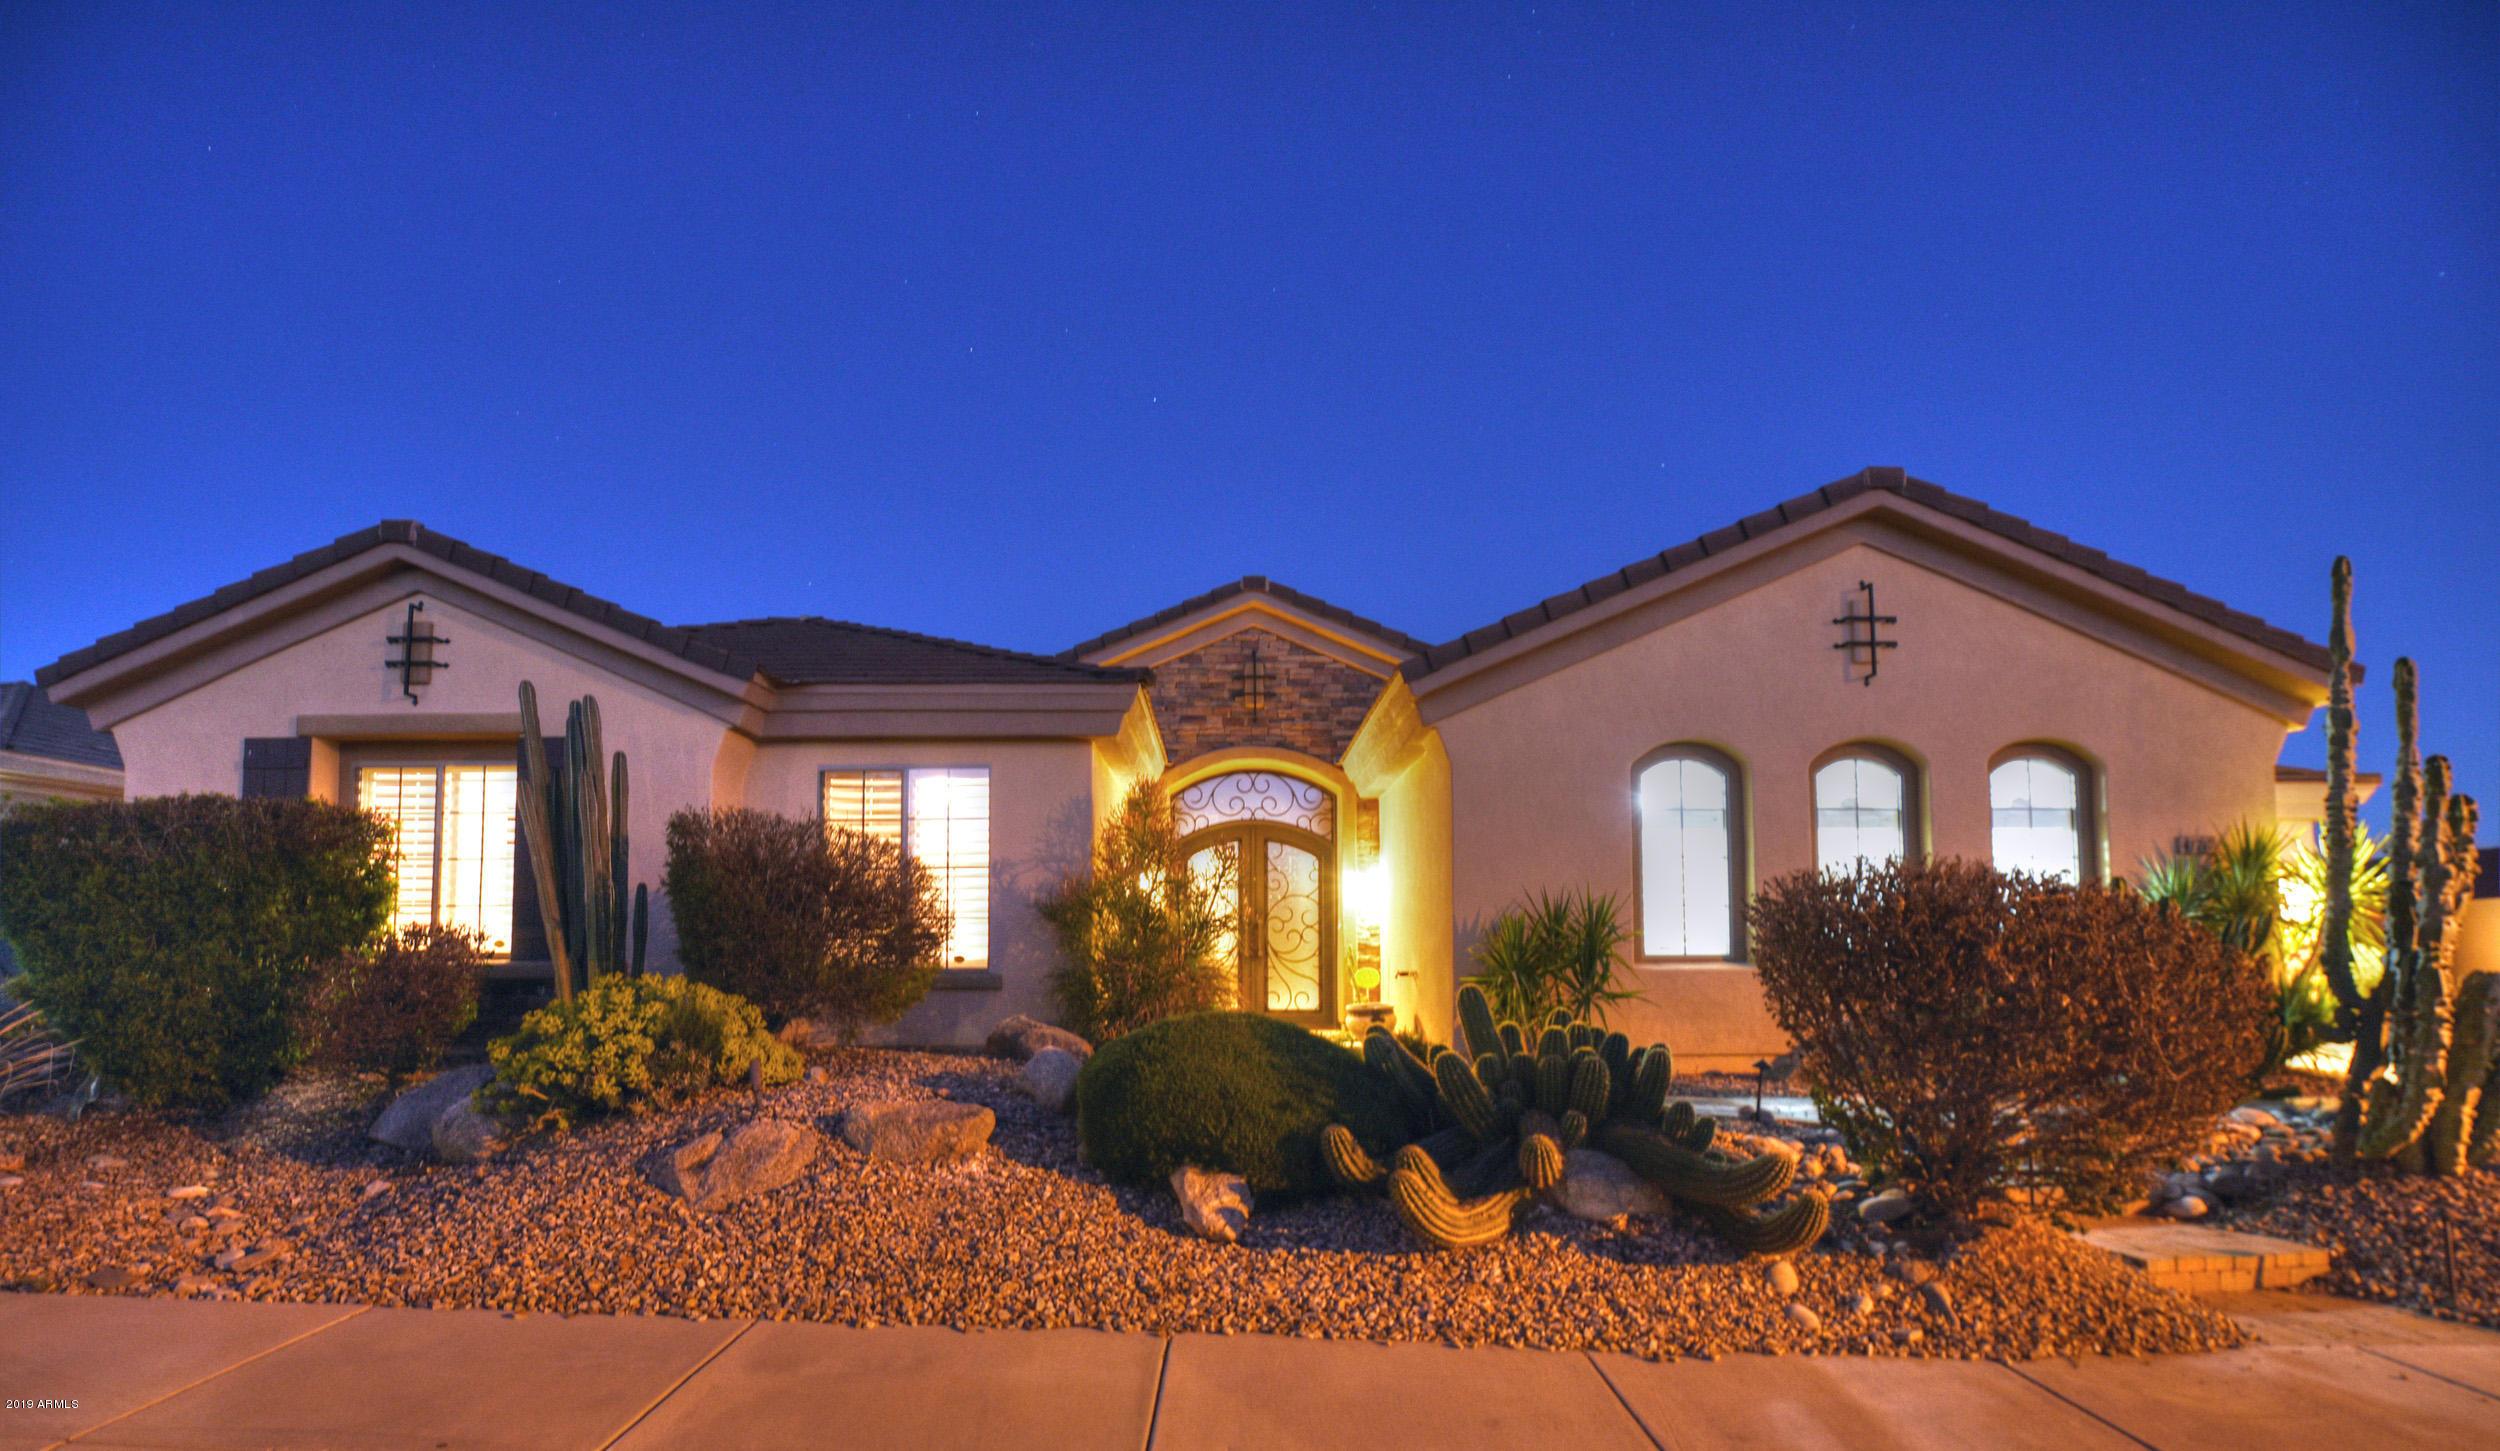 Photo of 41717 N CLUB POINTE Drive N, Phoenix, AZ 85086